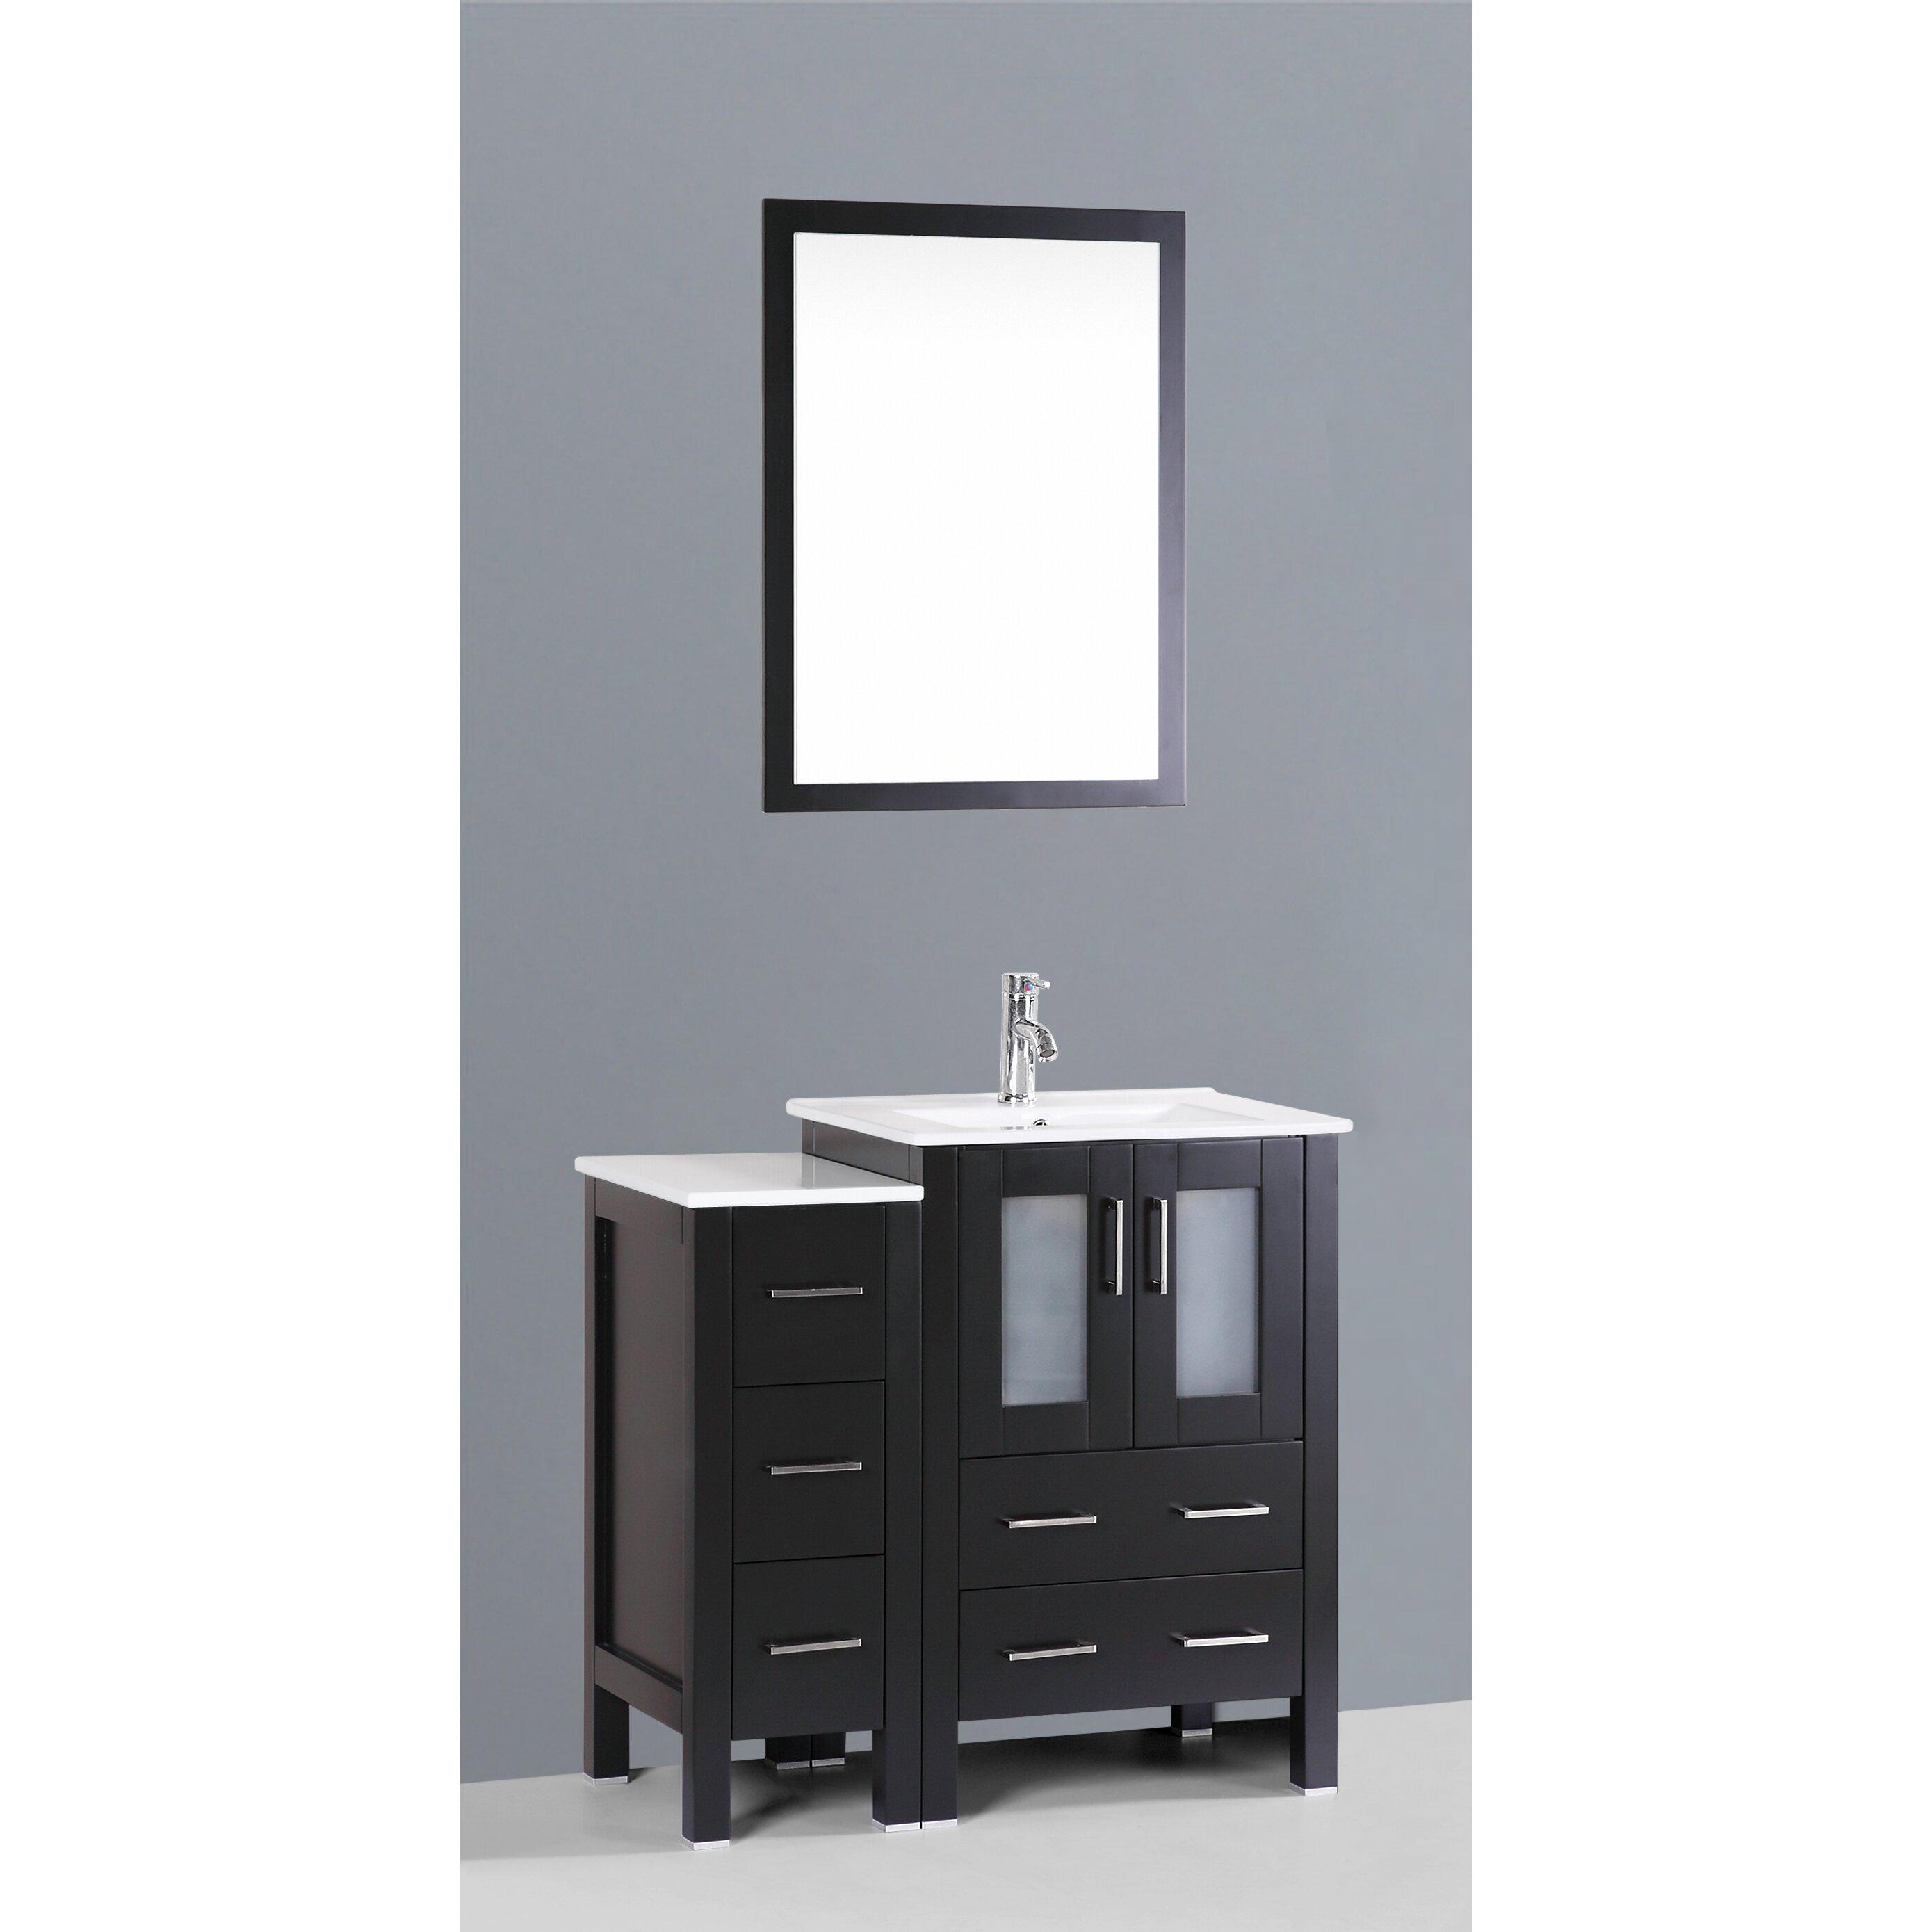 Bosconi Contemporary Single Vanity